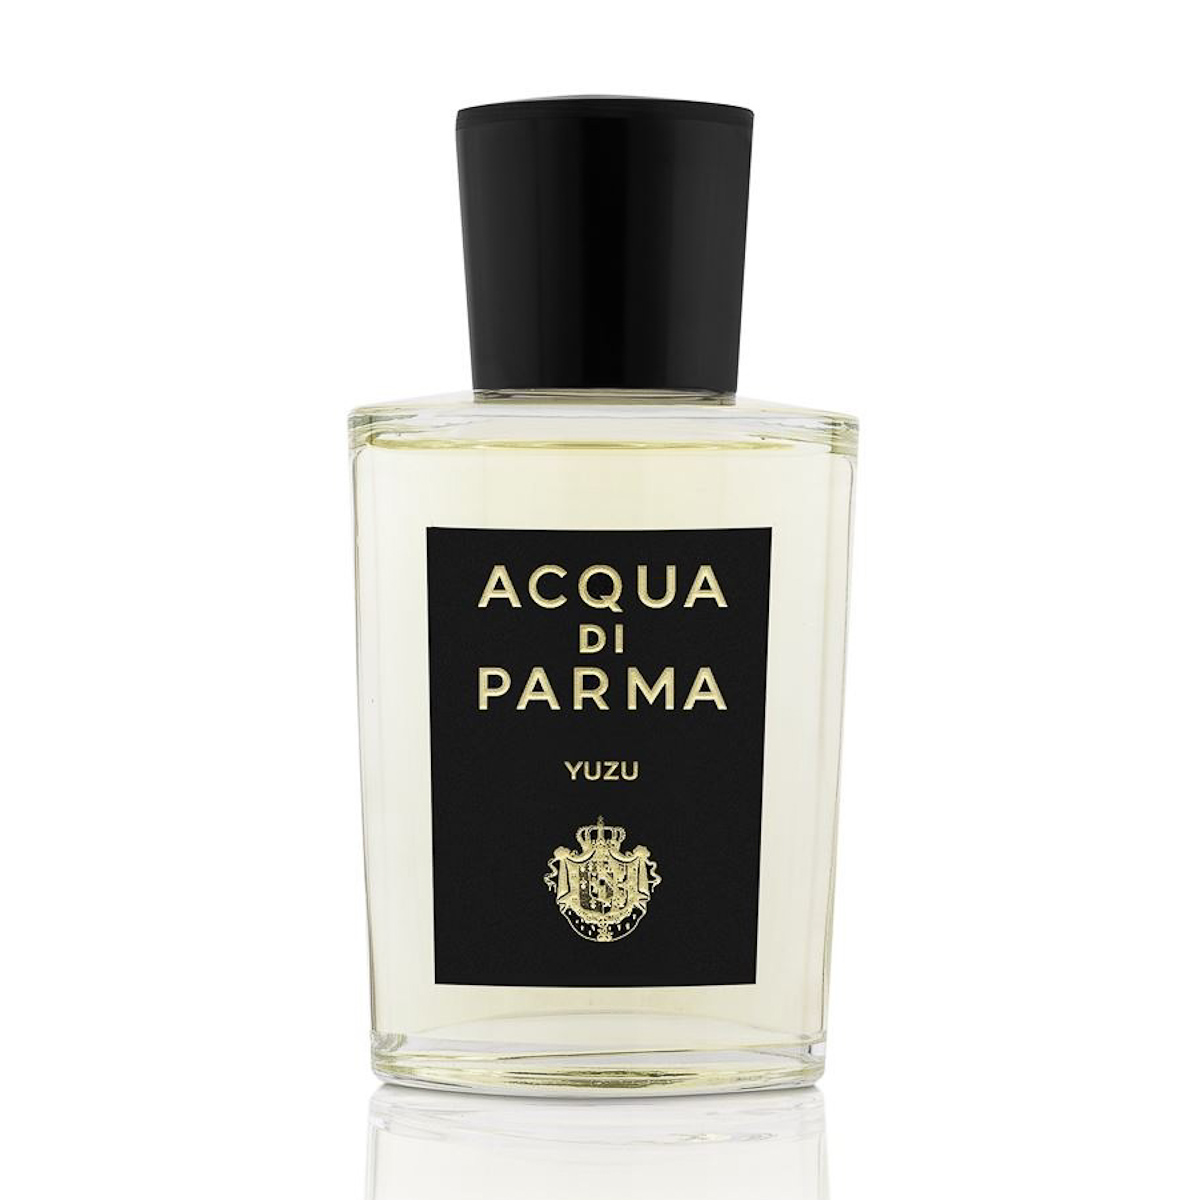 acqua-di-parma-yuzu-fragrance-grooming-man-for-himself